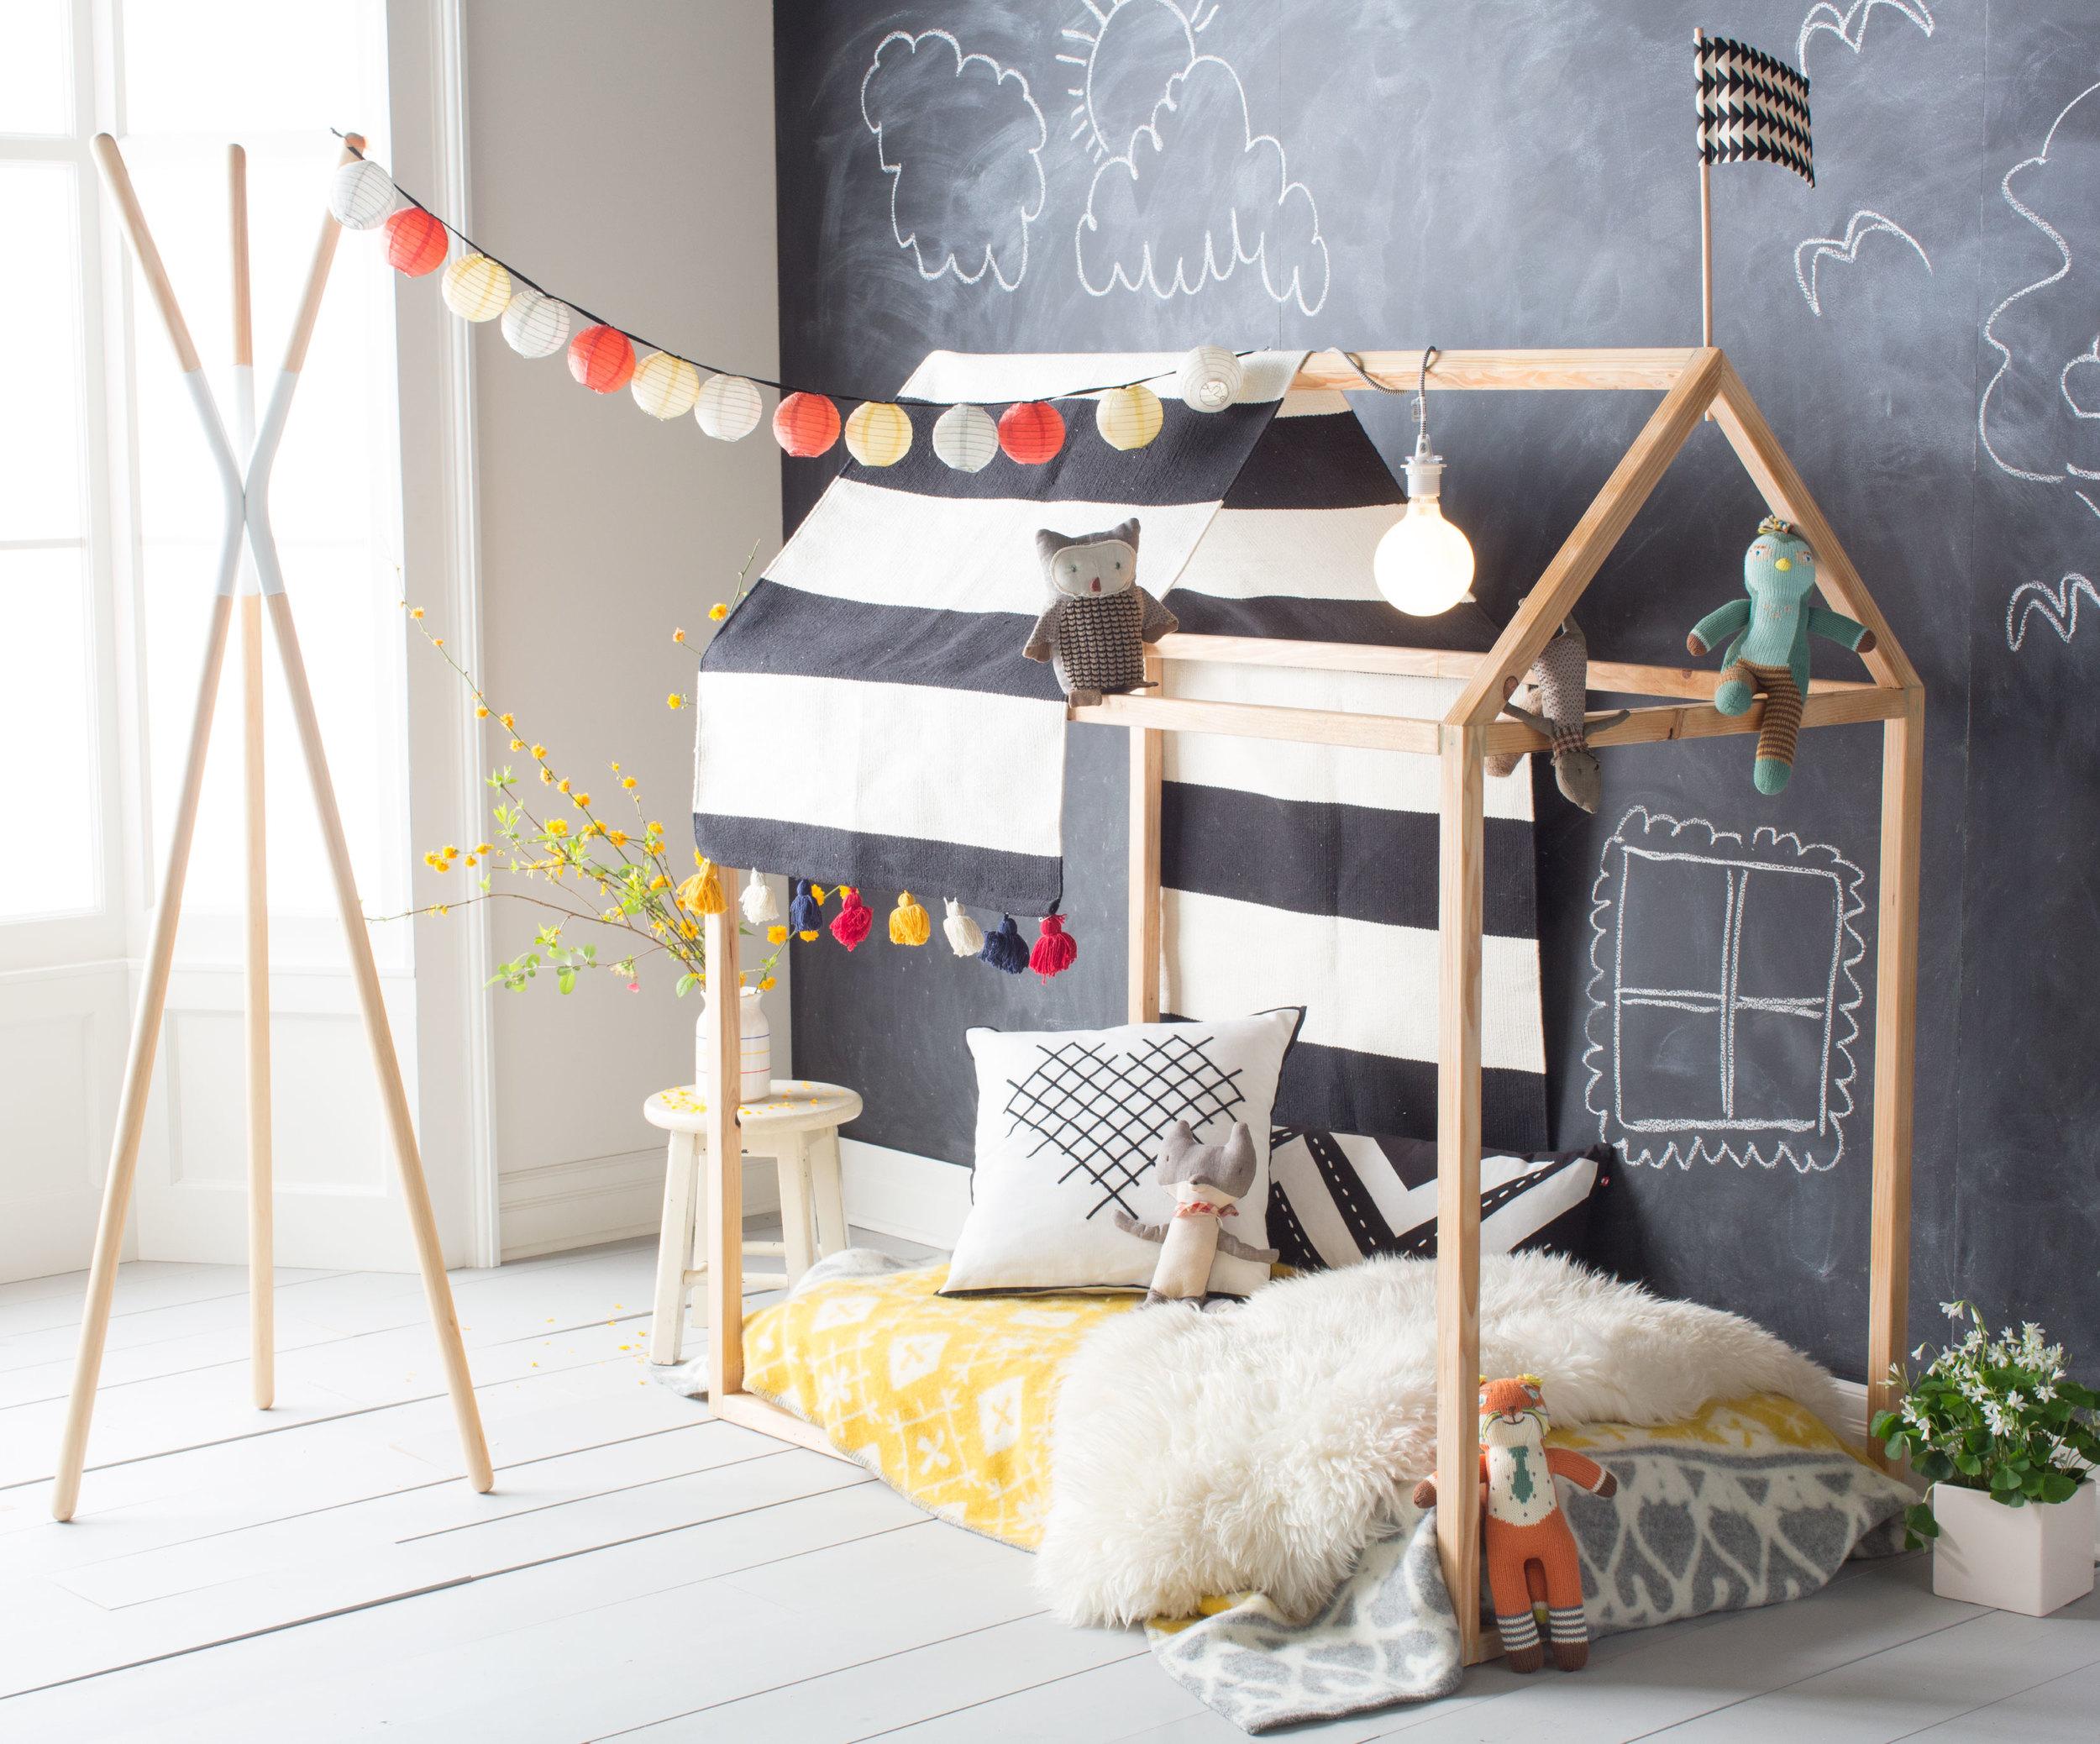 25 diy playhouses - Cool diy bed frames ...